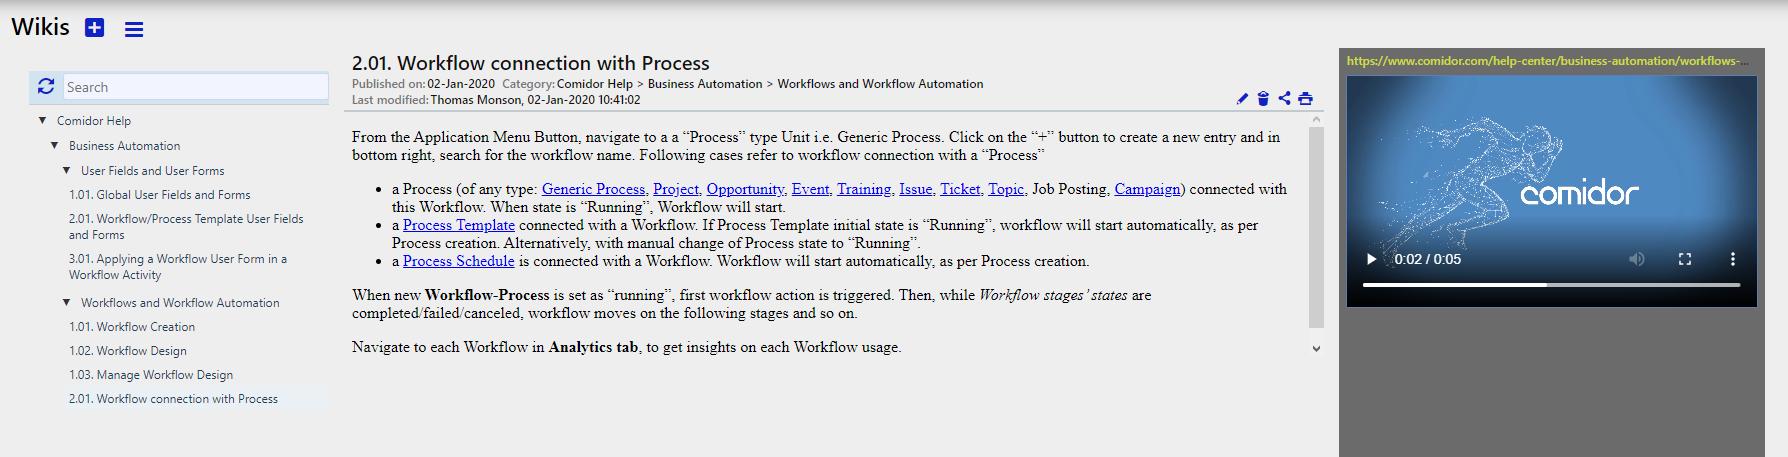 Wikis preview   Comidor Digital Automation Platform